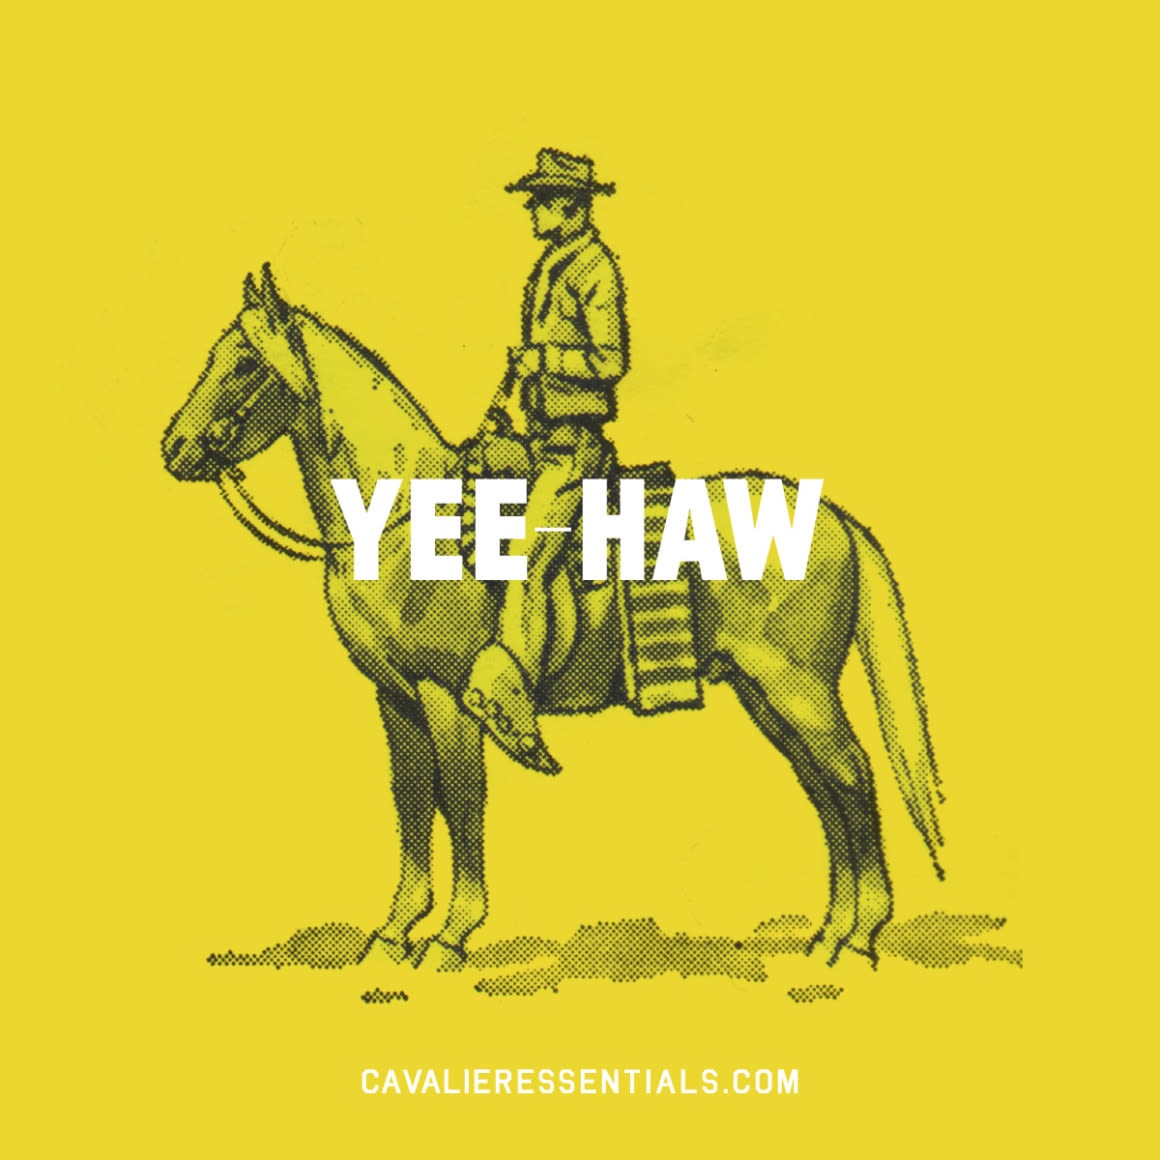 Cav yee haw